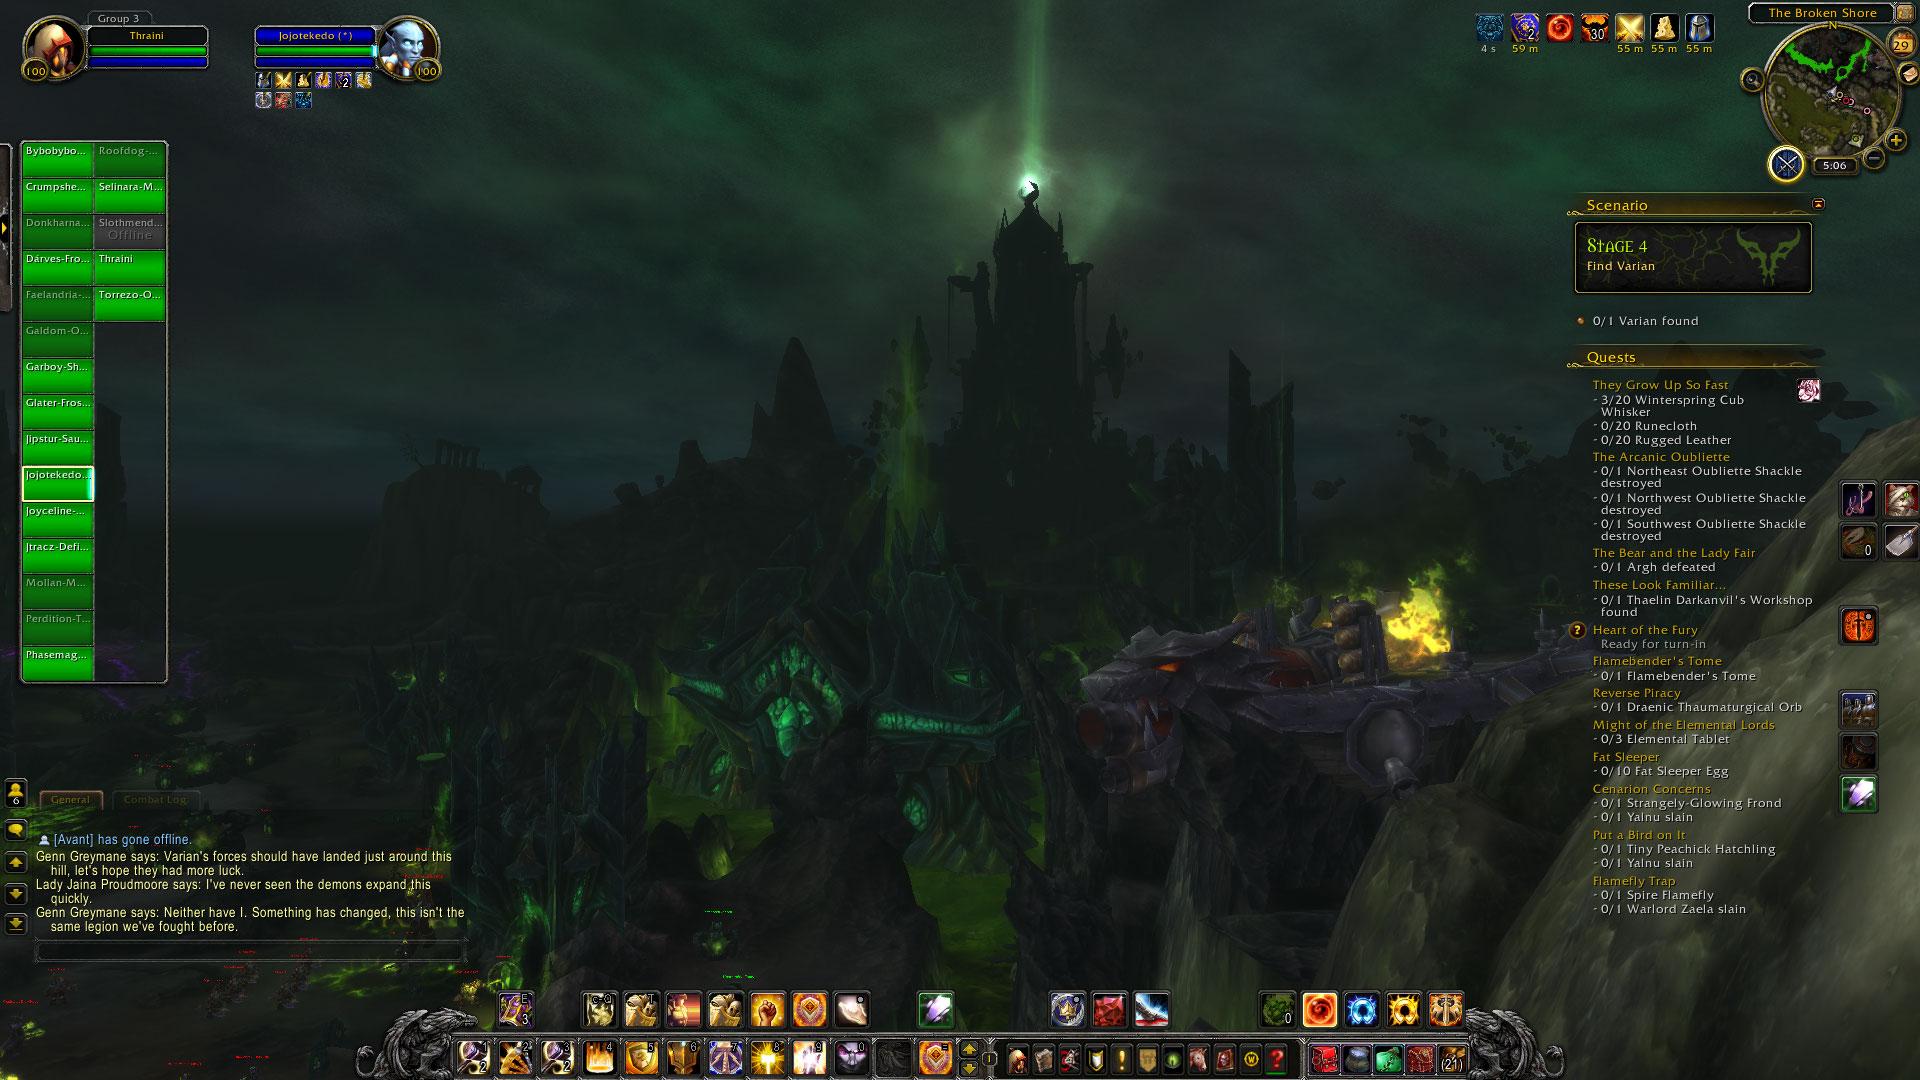 World of Warcraft: Legion fotoseriál - Plamenná legie přichází 129830